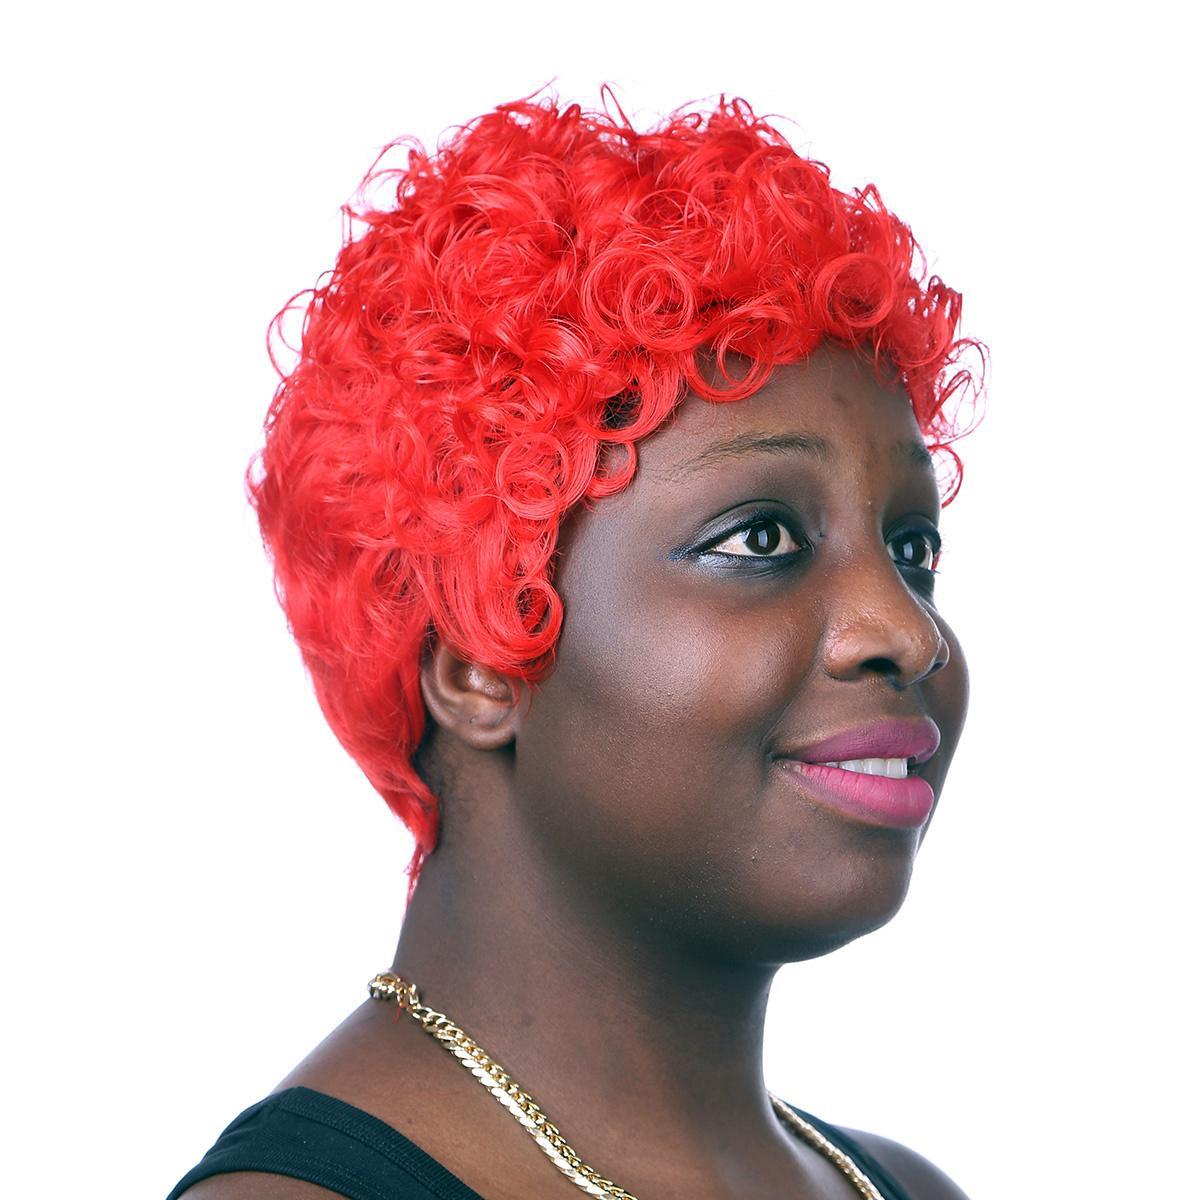 Xiu Zhi Mei 2017 Fashion Red Short Curly Synthetic Hair Wigs Heat Resistant Hair African American Women Full Wigs